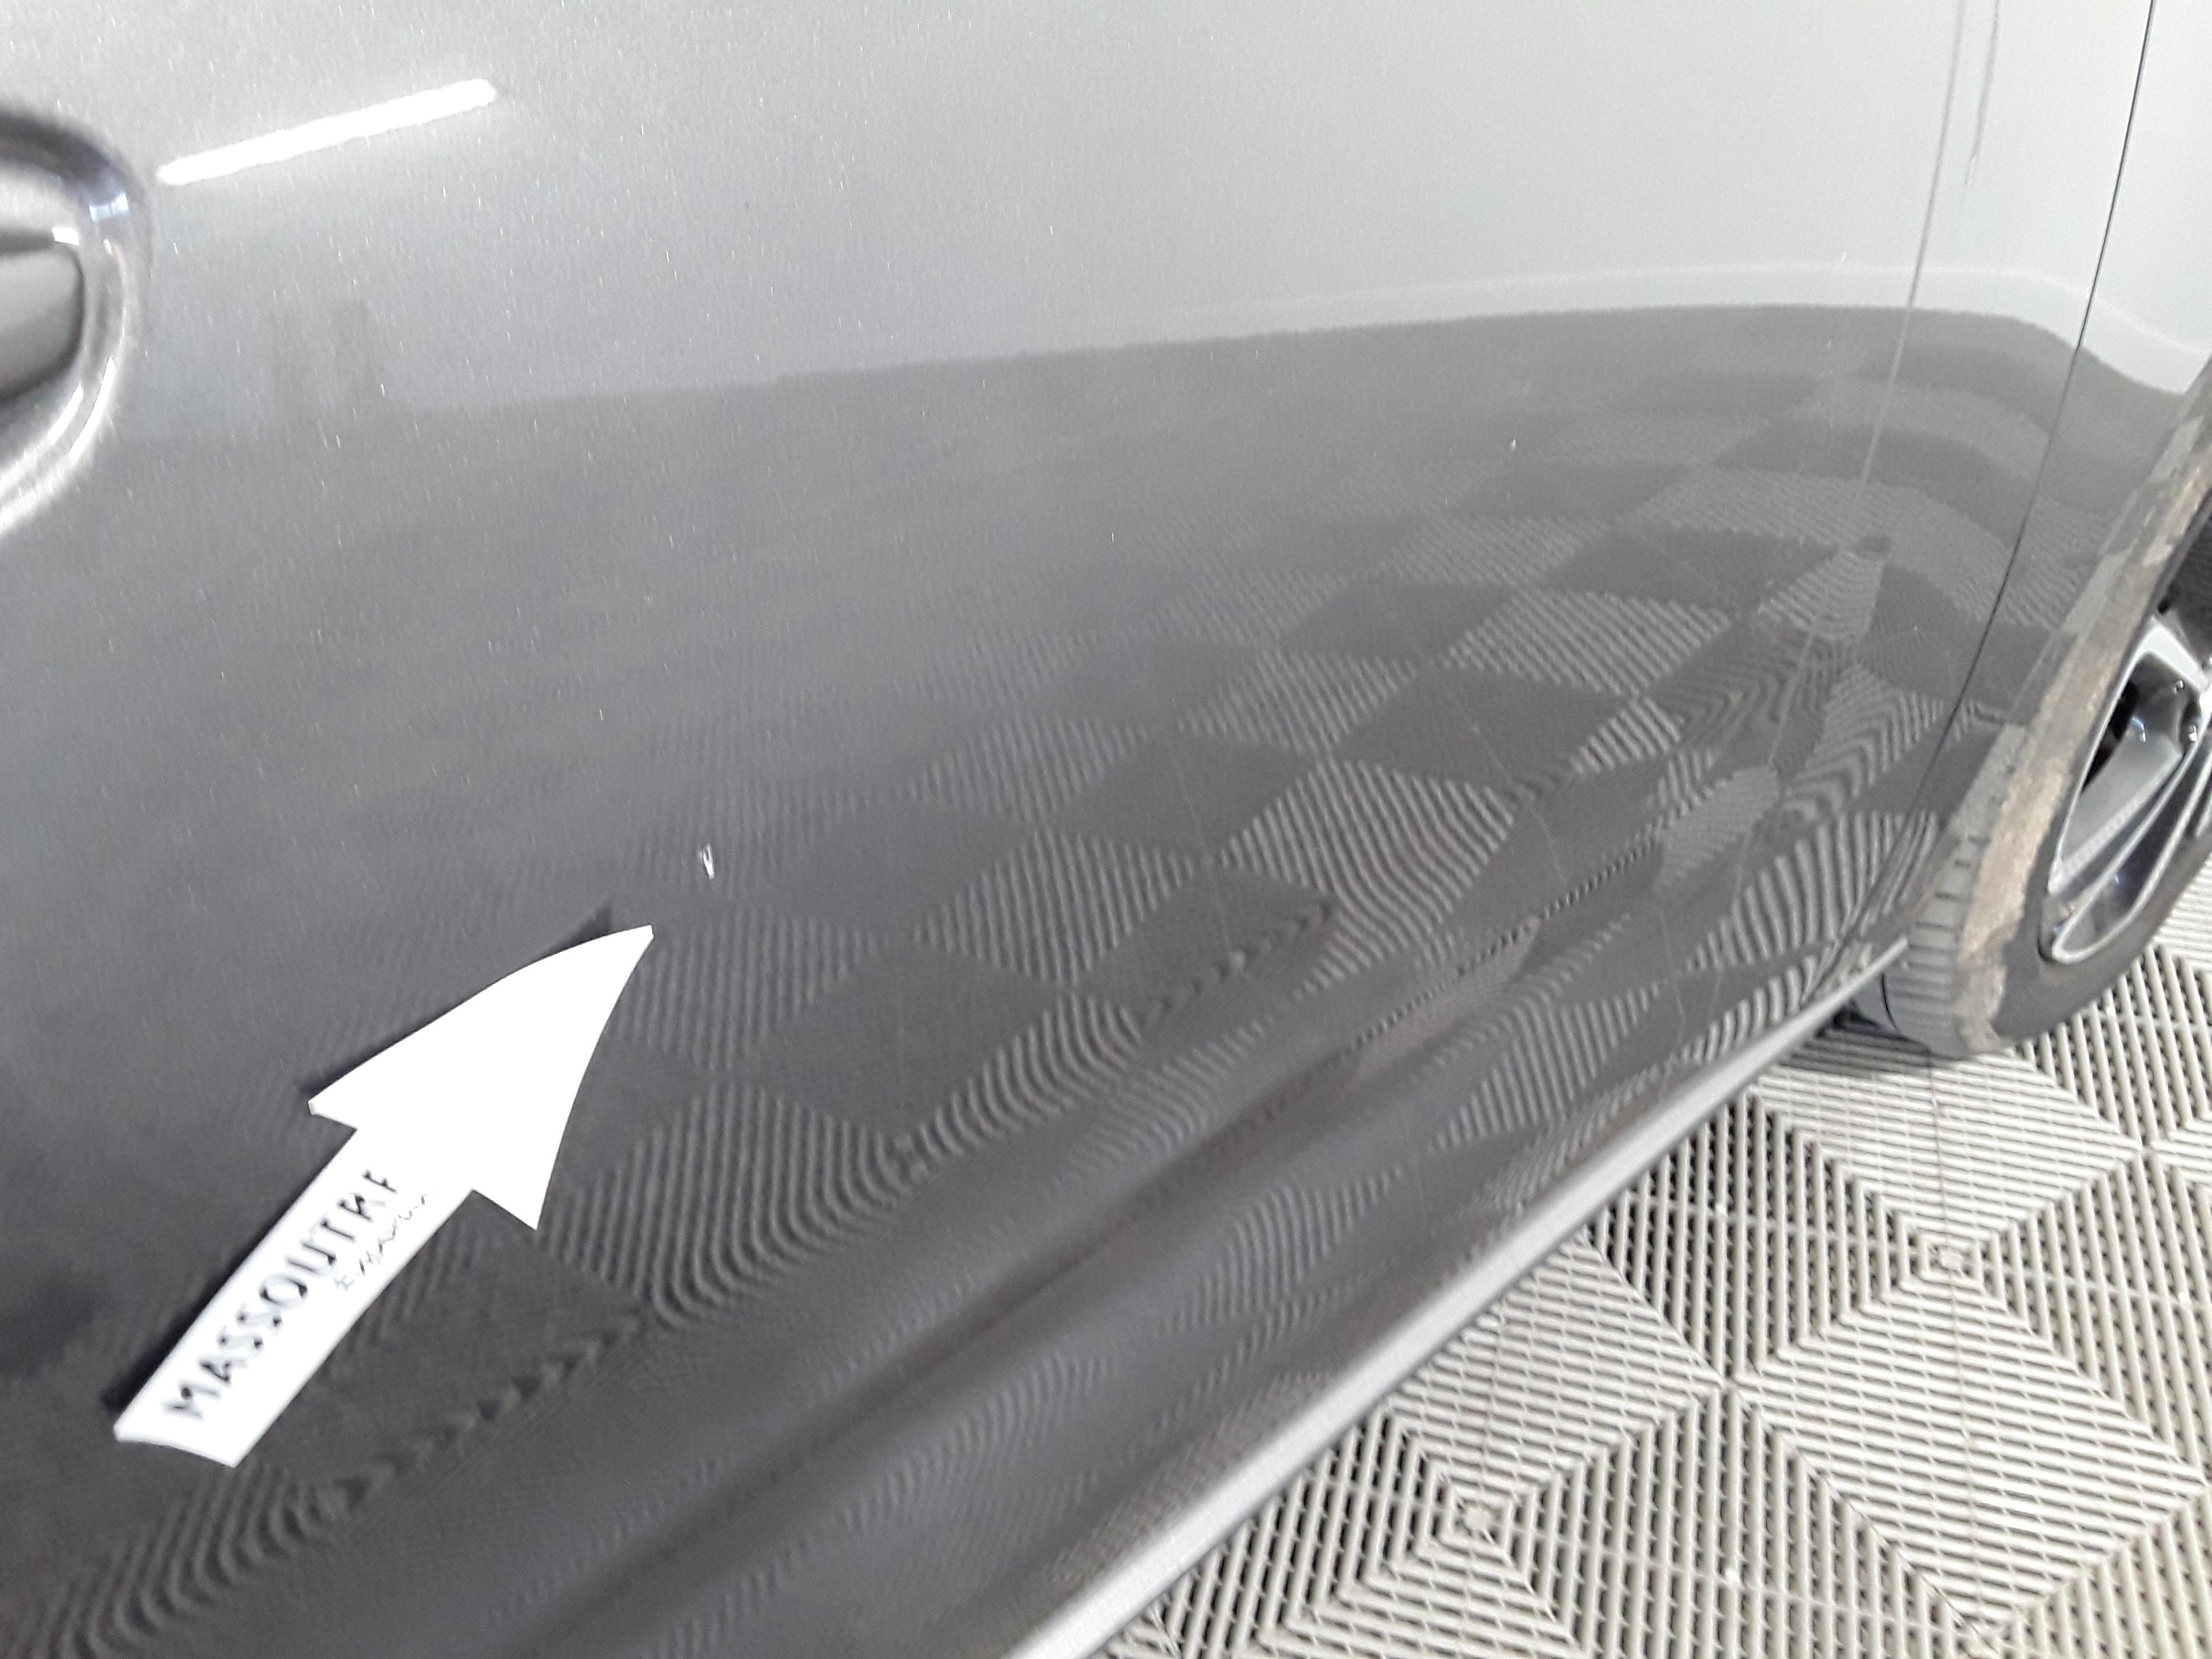 CITROEN C4 SPACETOURER 2019 - Photo n°6